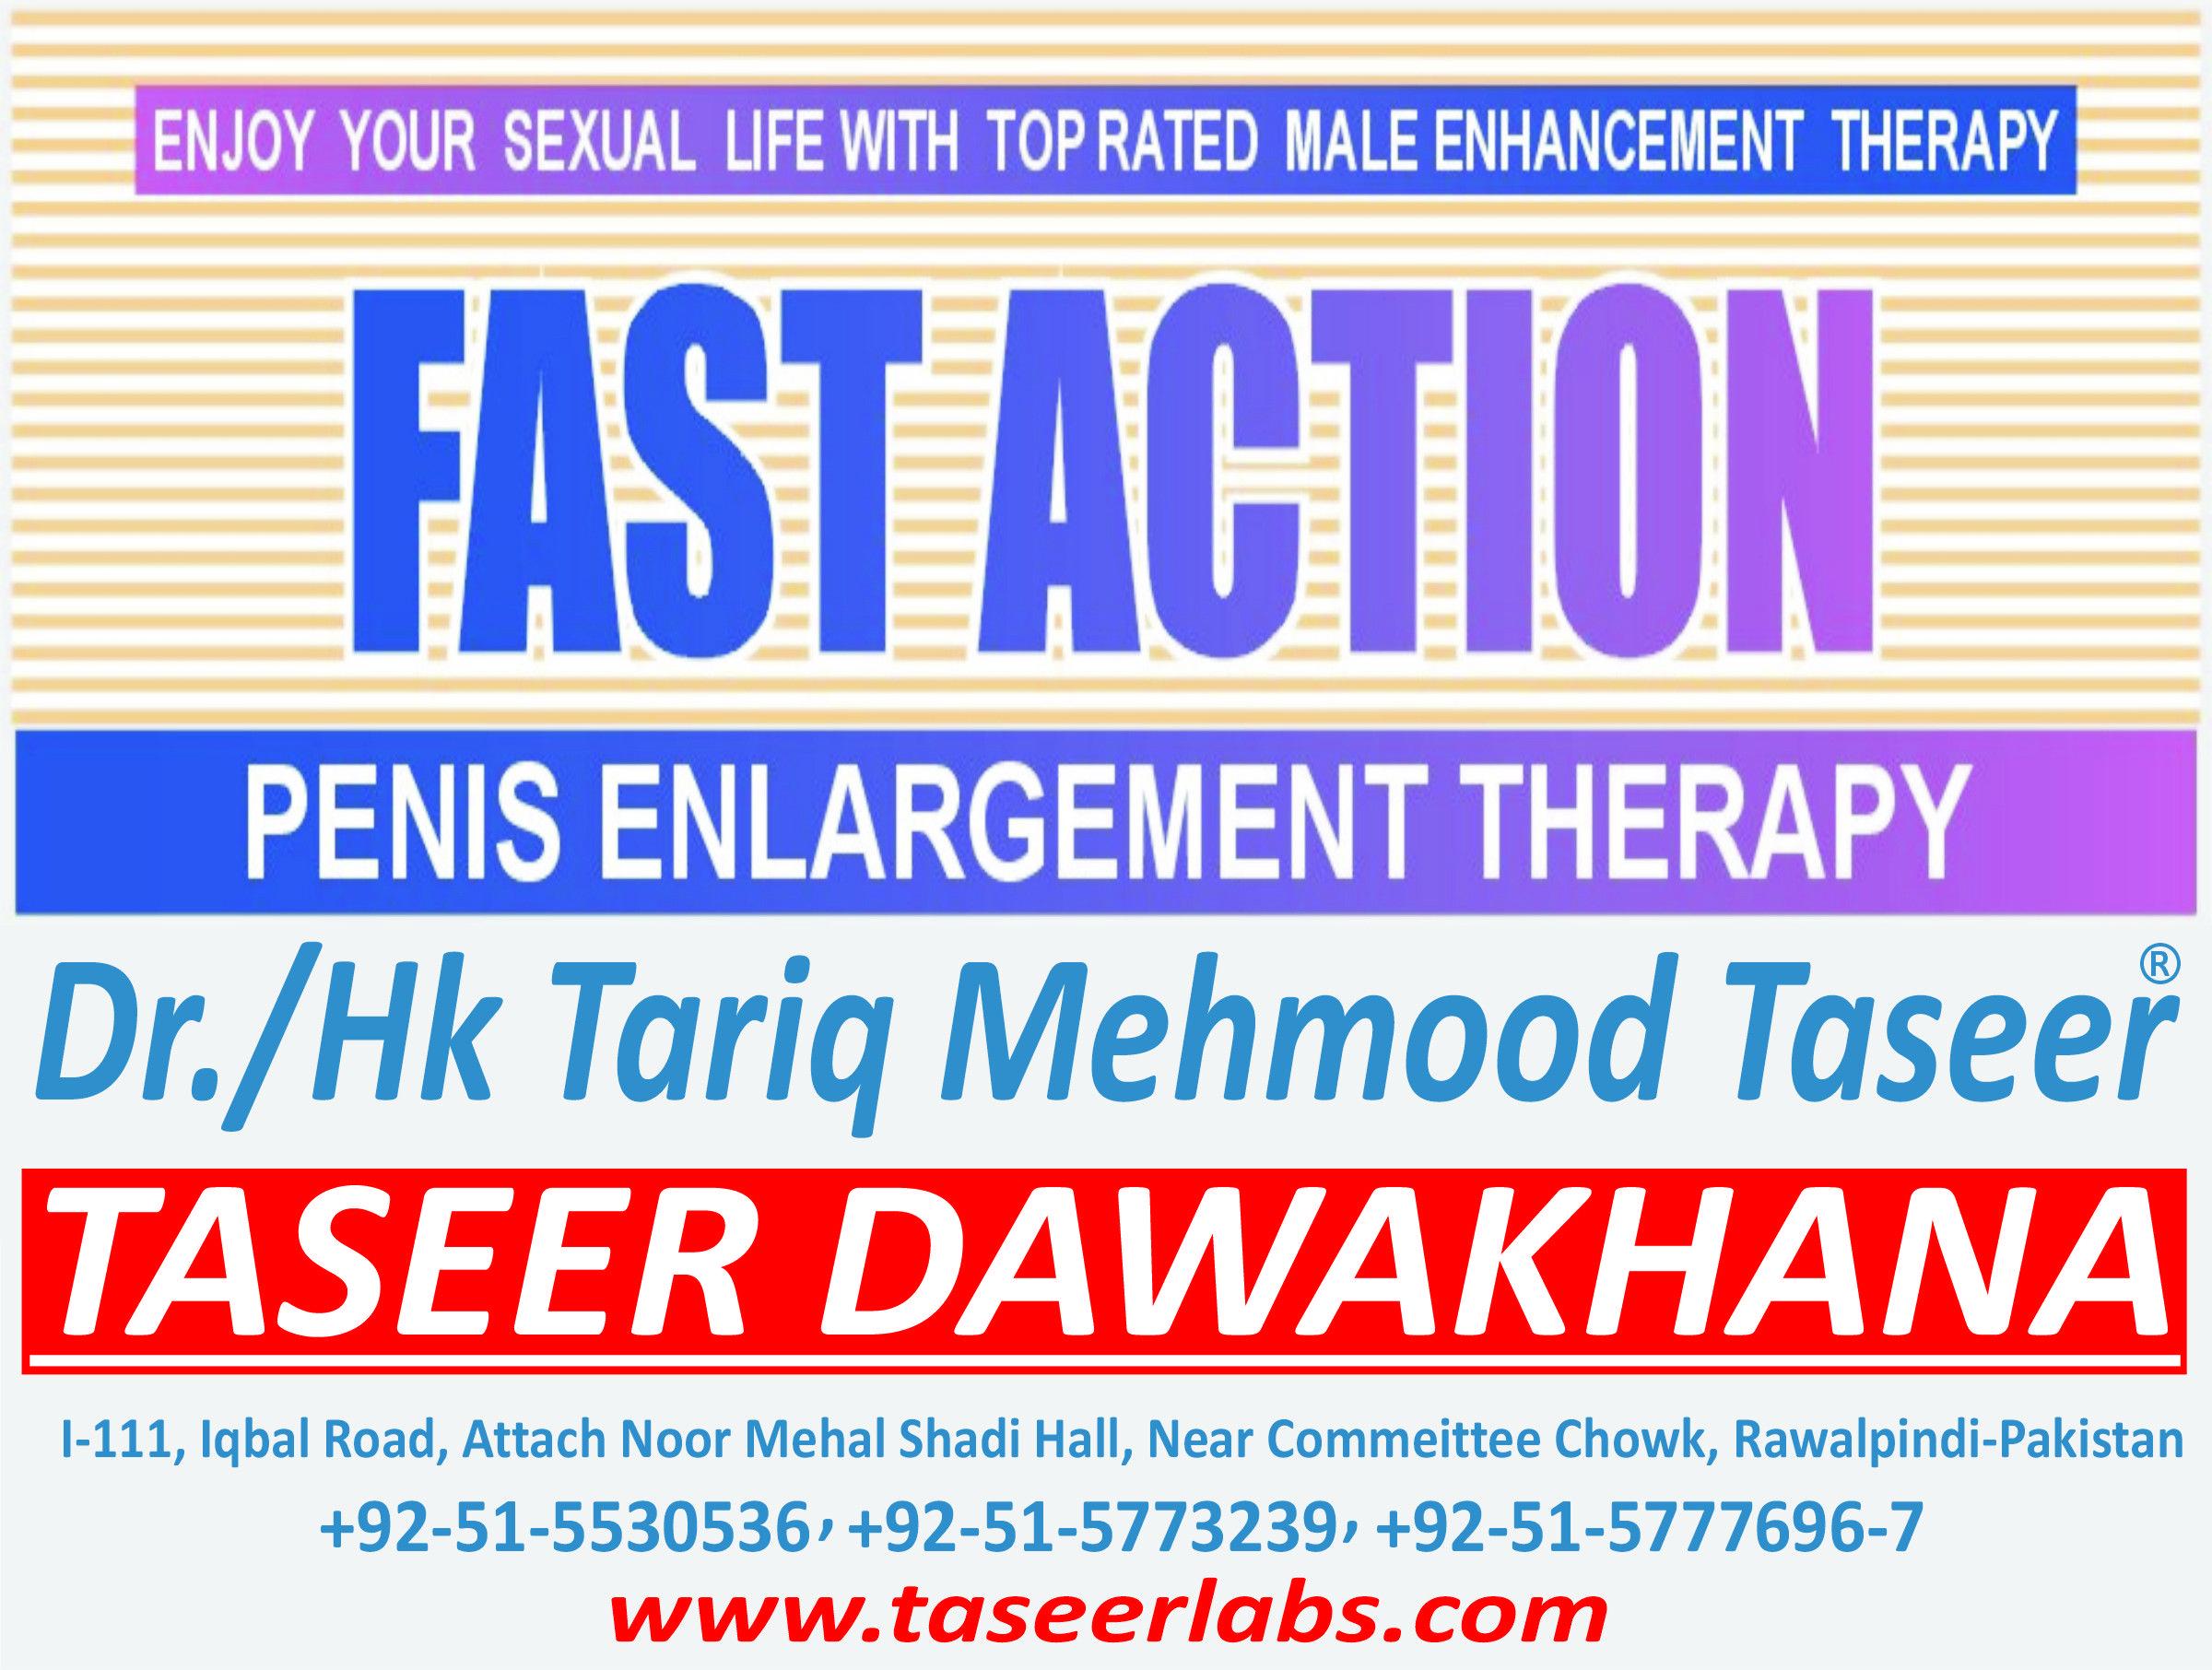 Pin On Taseer Dawakhana Rawalpindi